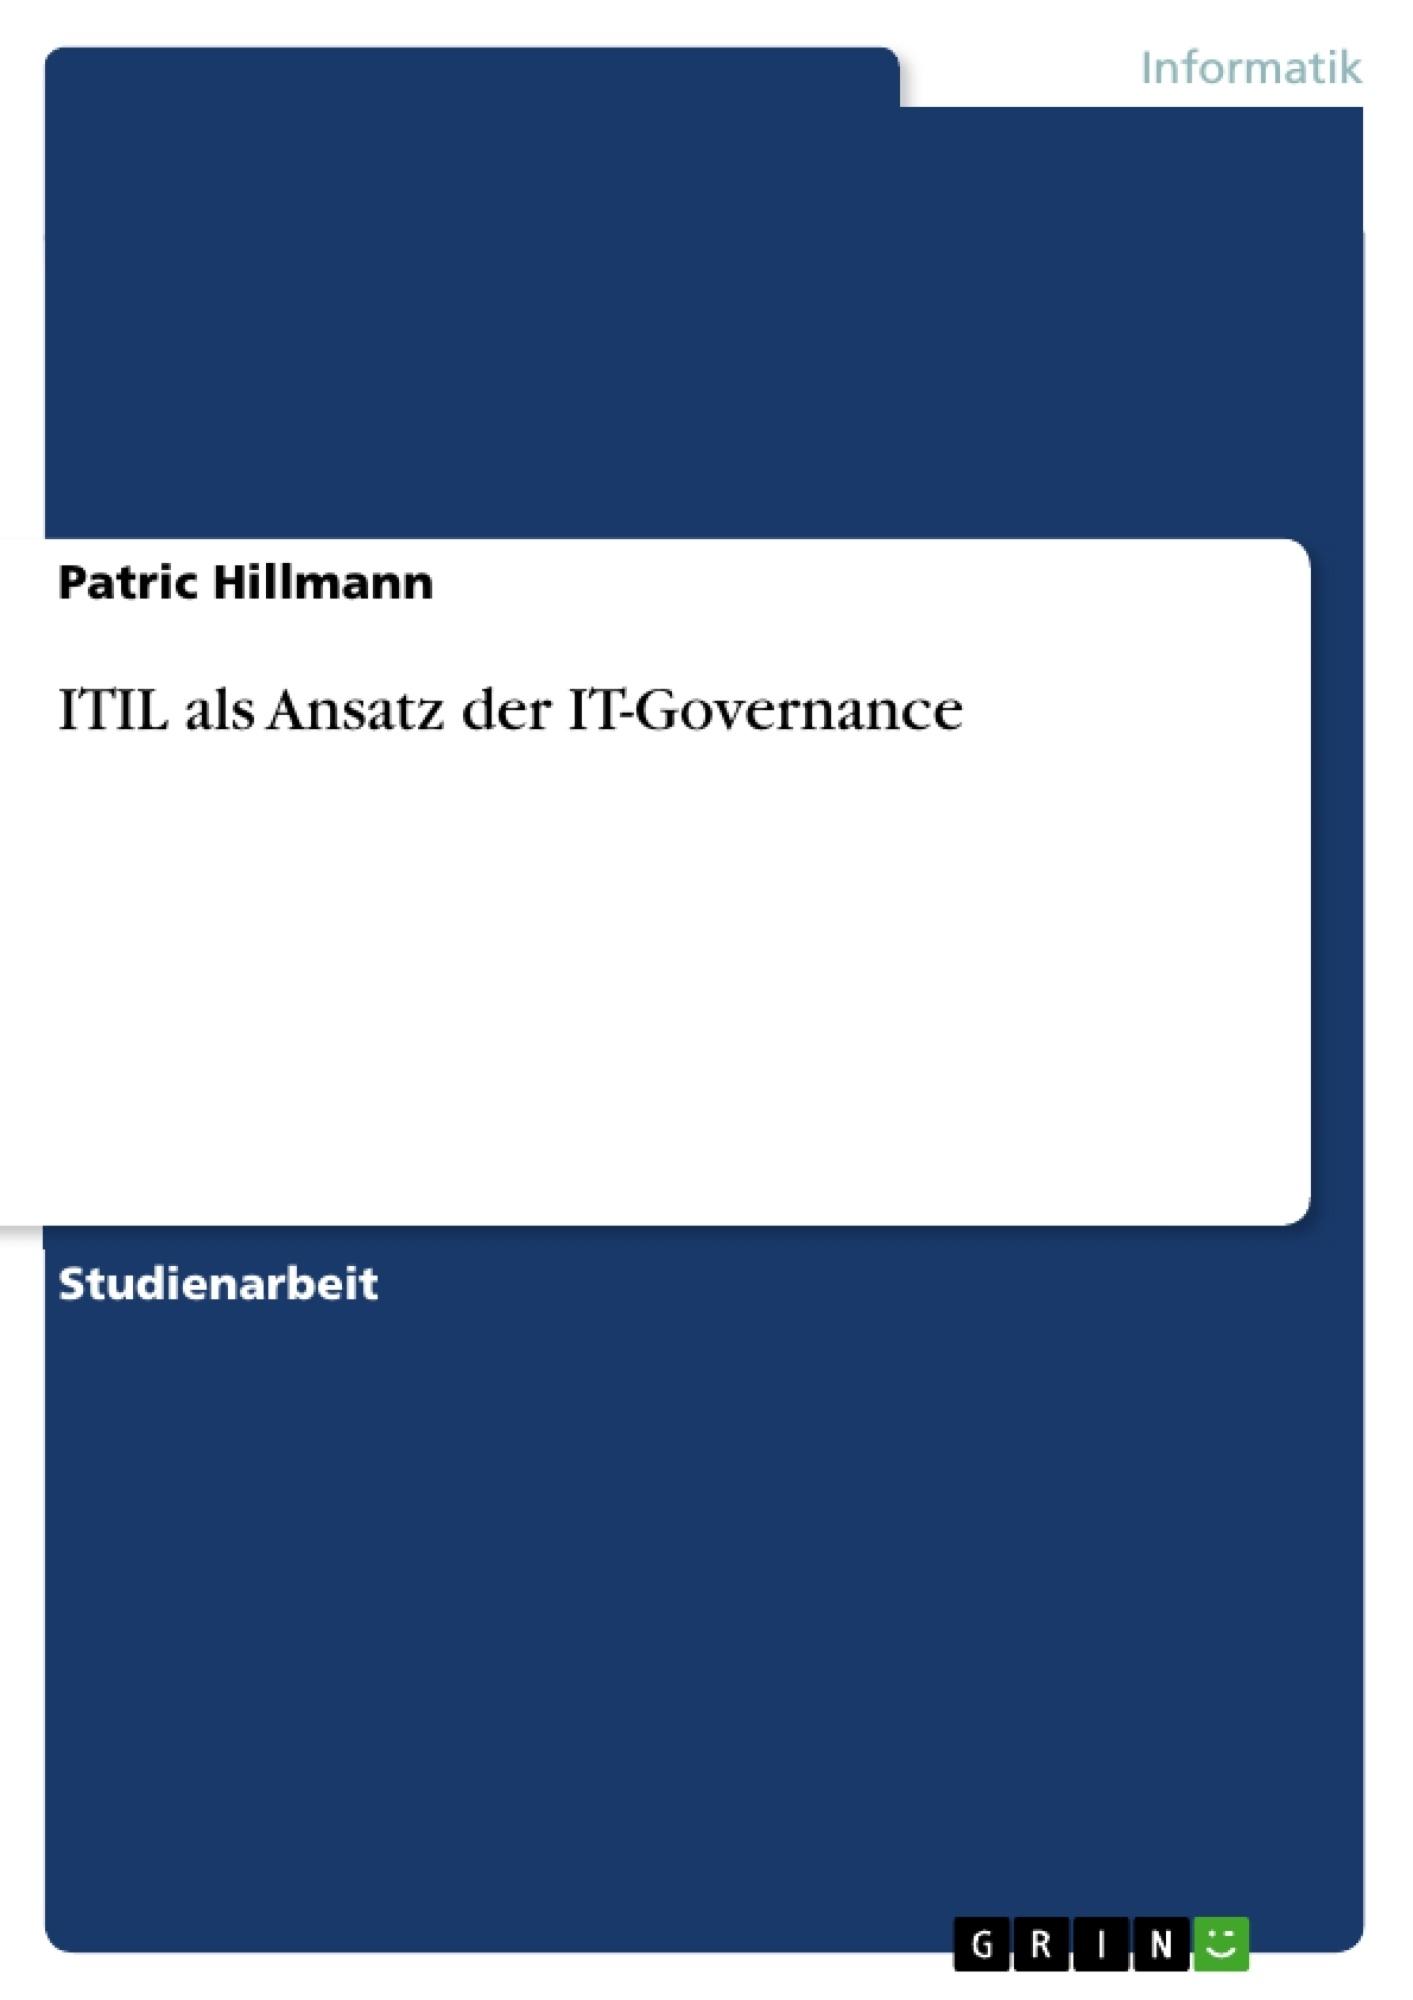 Titel: ITIL als Ansatz der IT-Governance